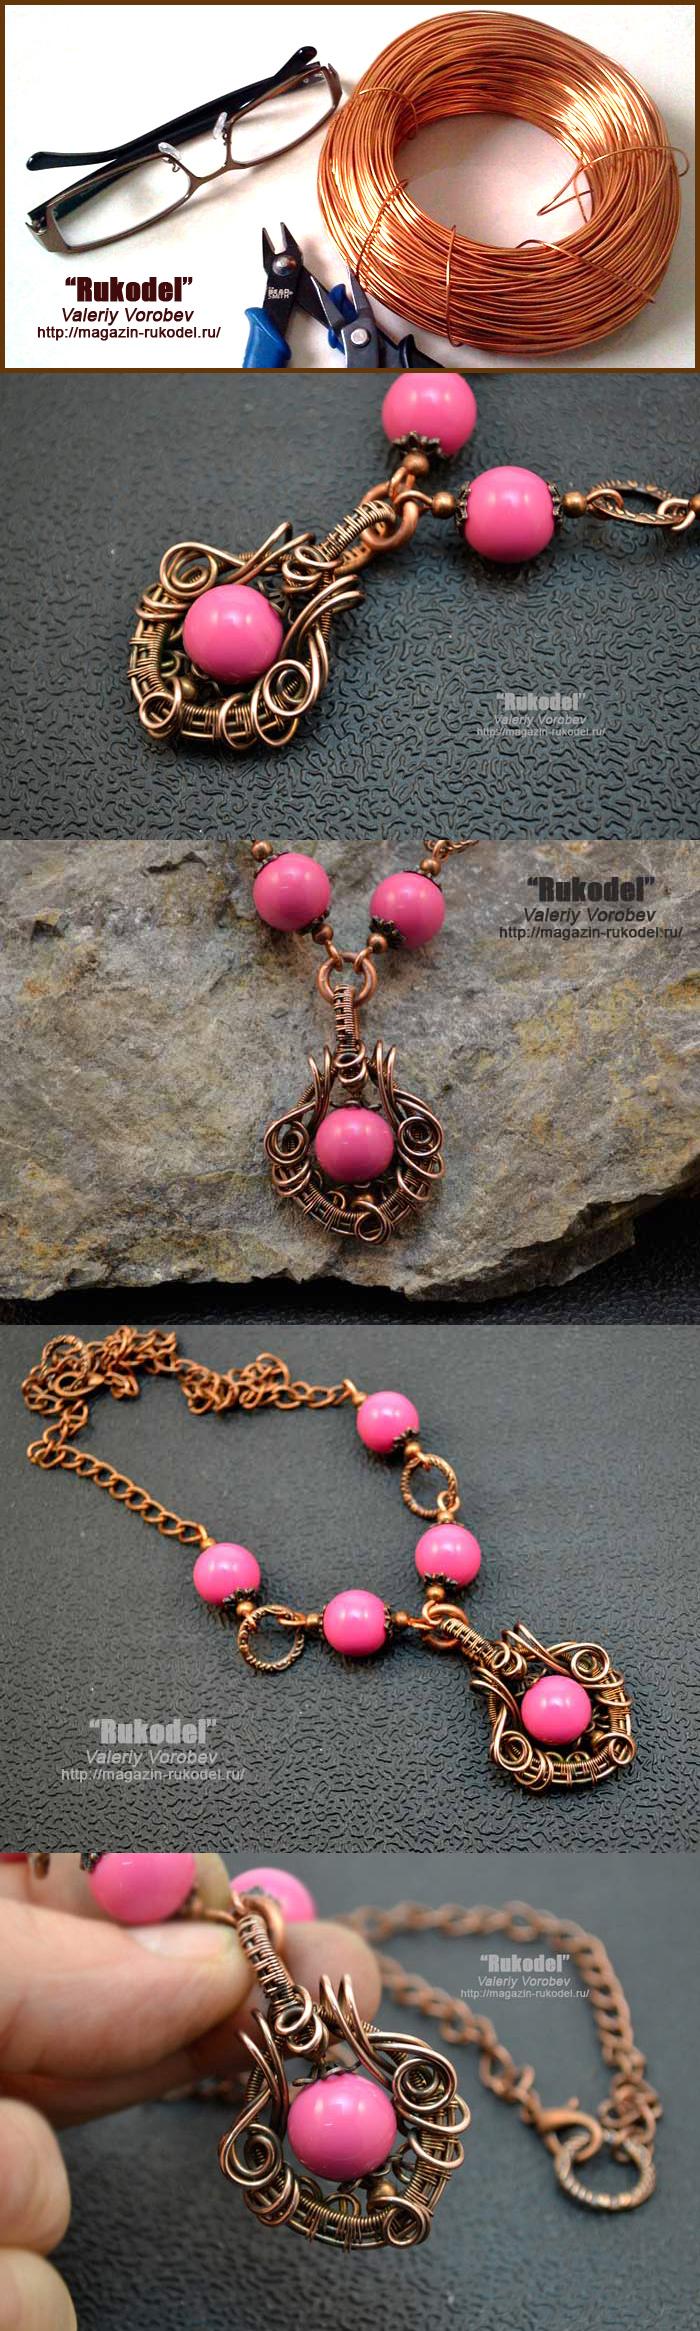 Ожерелье из проволоки своими руками в технике Wire Wrap.